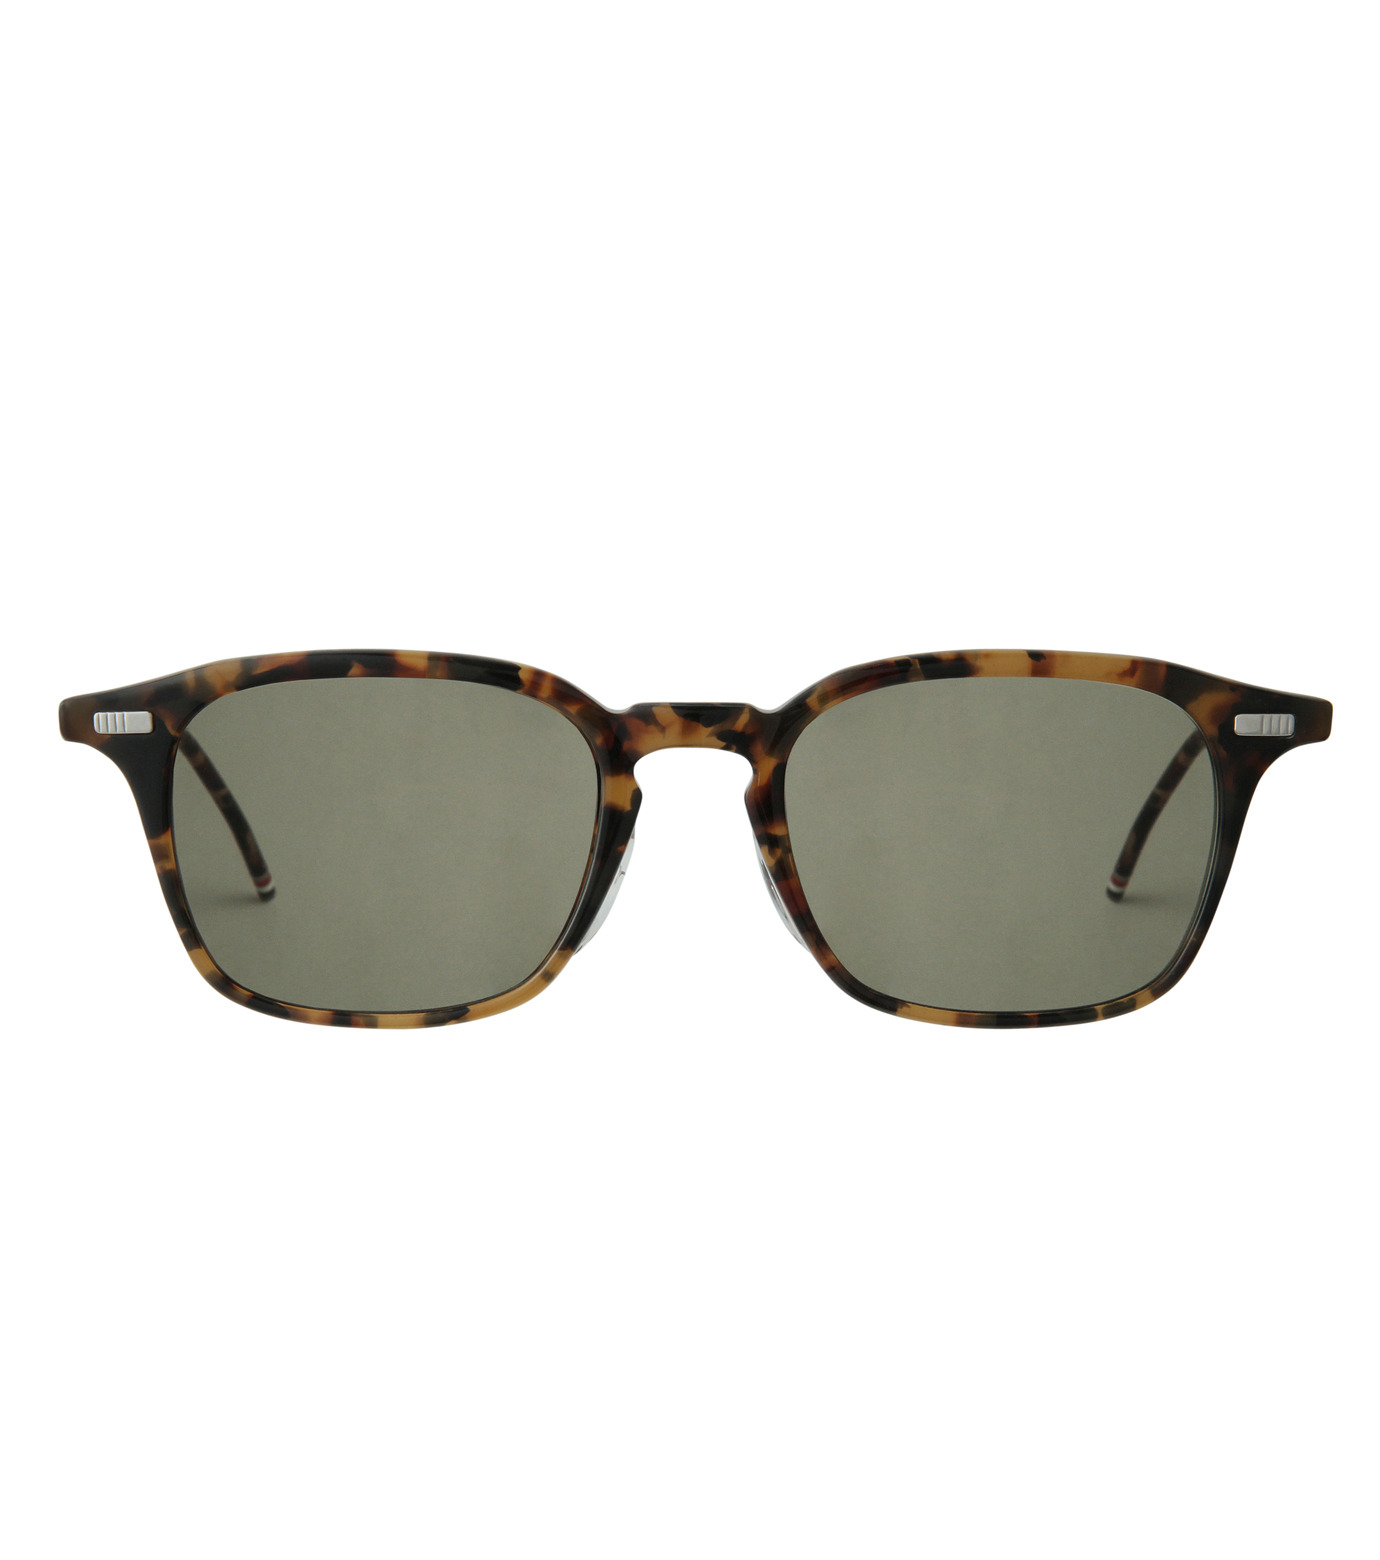 Thom Browne Eye Wear(トム・ブラウン・アイウェア)のWellington-BROWN(アイウェア/eyewear)-TB-406-B-T-42 拡大詳細画像3